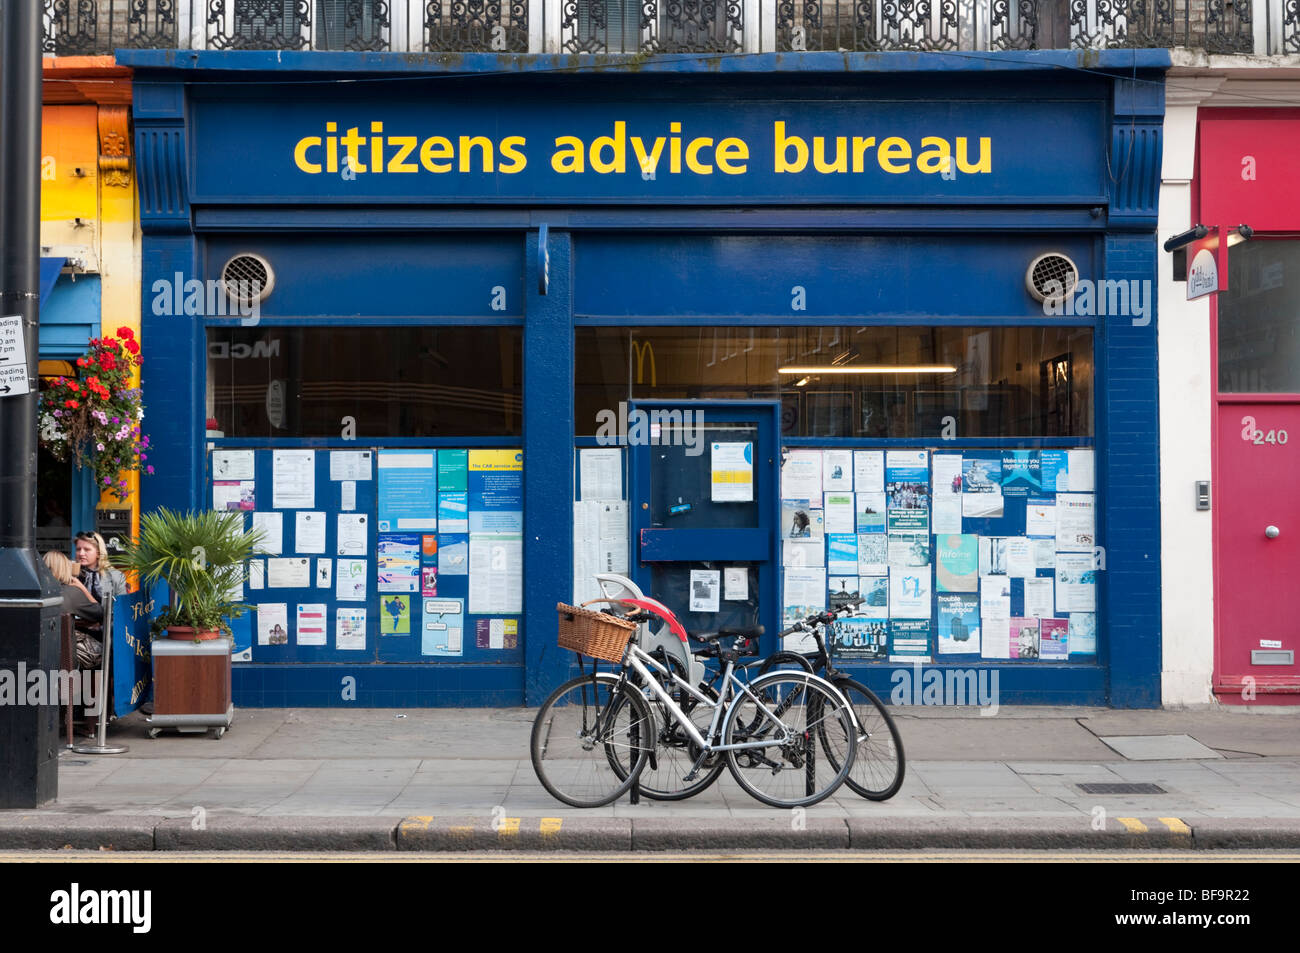 citizens advice bureau in london england uk stock photo royalty free image 26645866 alamy. Black Bedroom Furniture Sets. Home Design Ideas